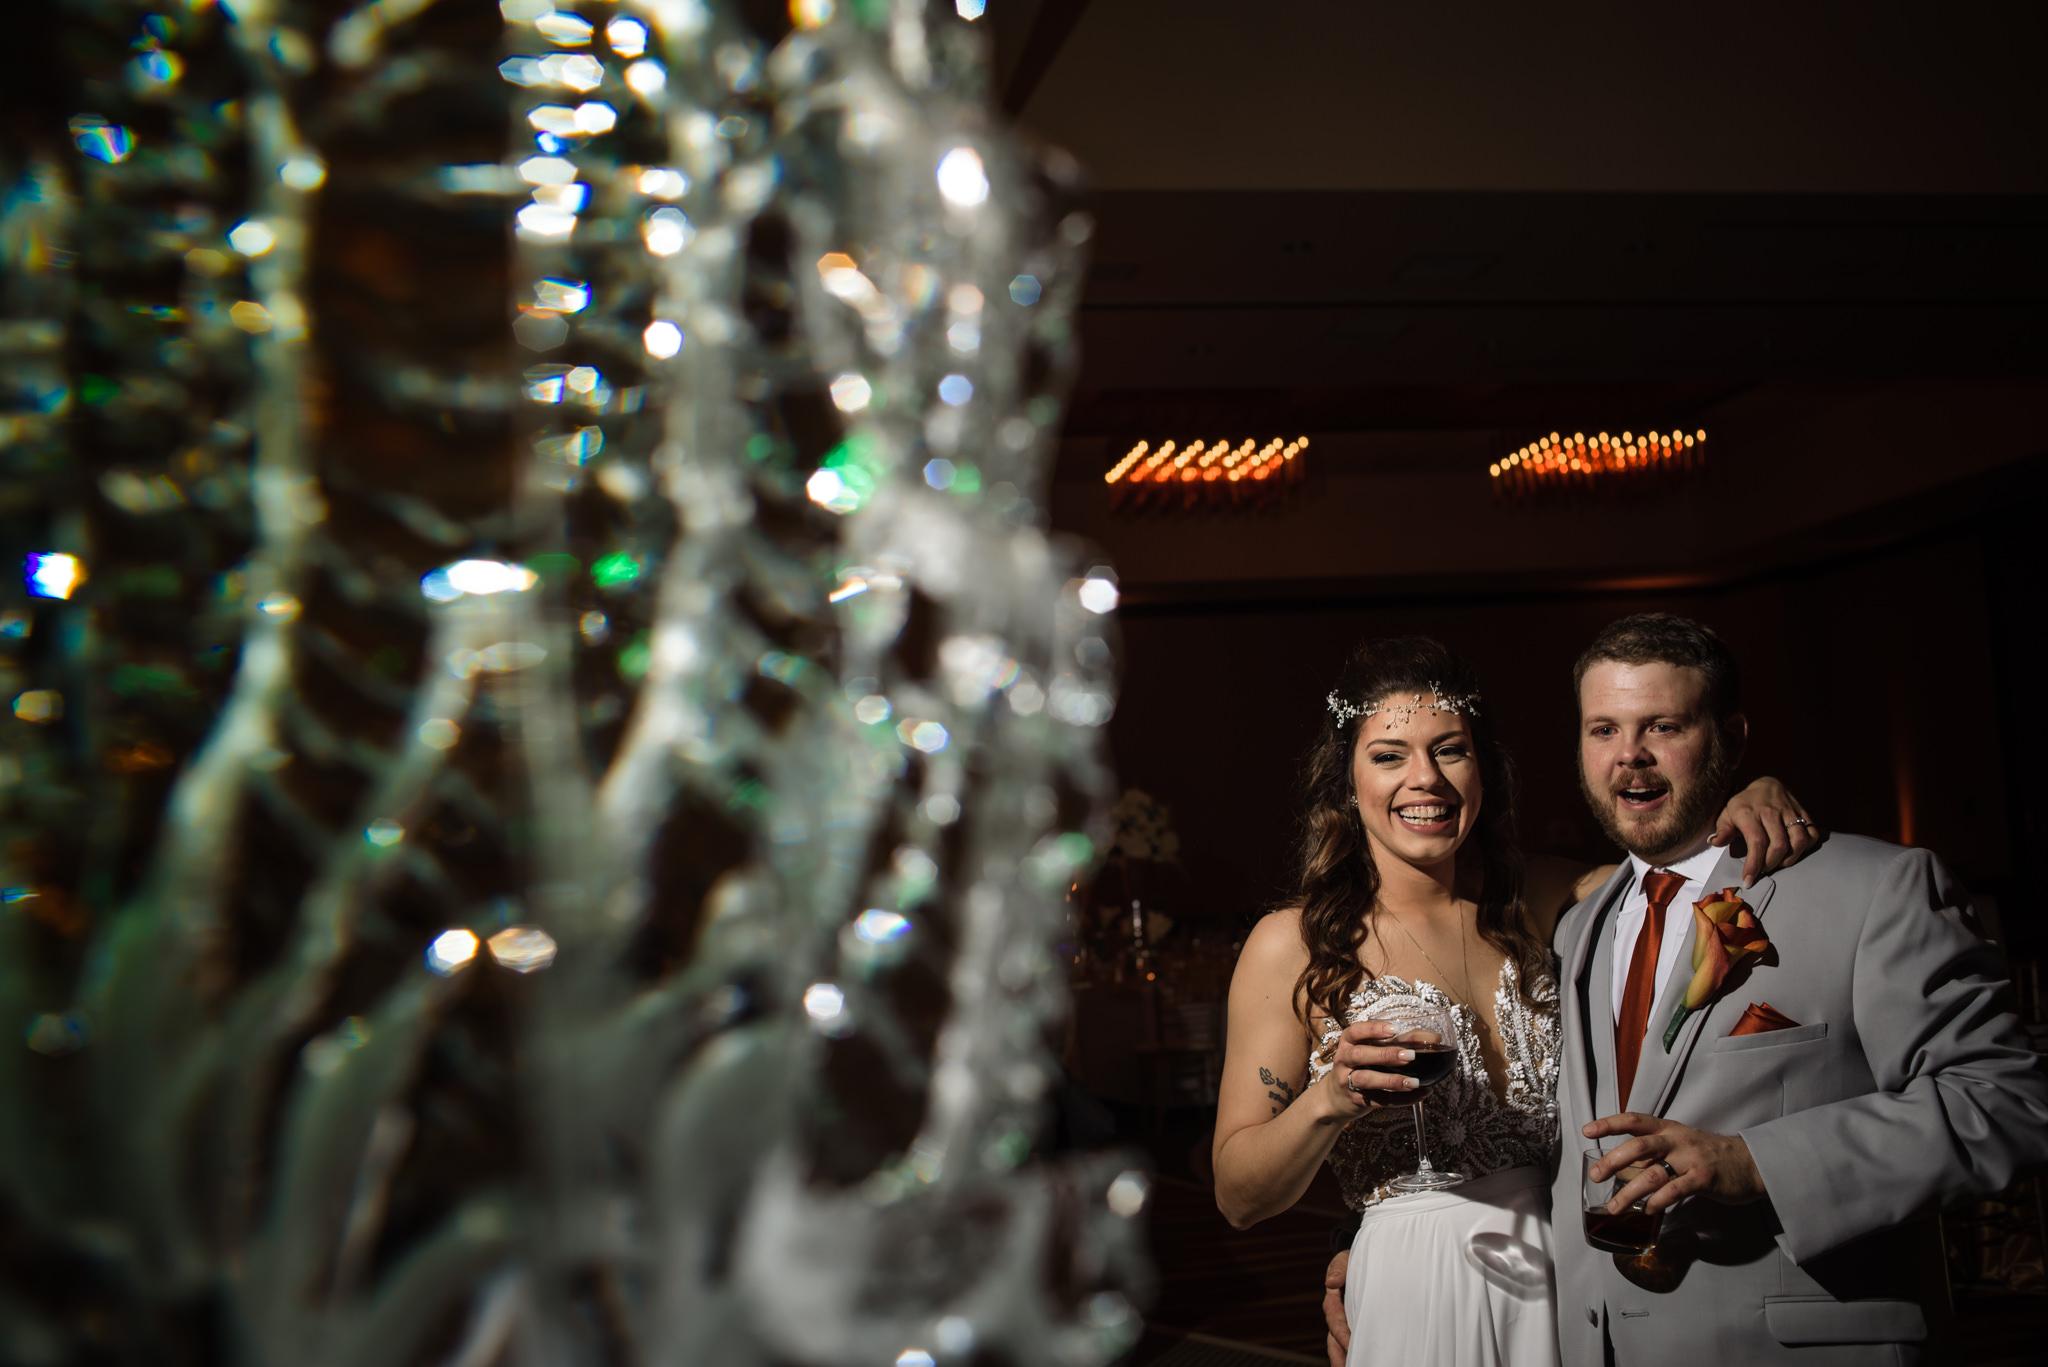 HILTON-OMAHA-WEDDING-PHOTOGRAPHER-JM-STUDIOS-OMAHA-LIV-BRICE-033.jpg